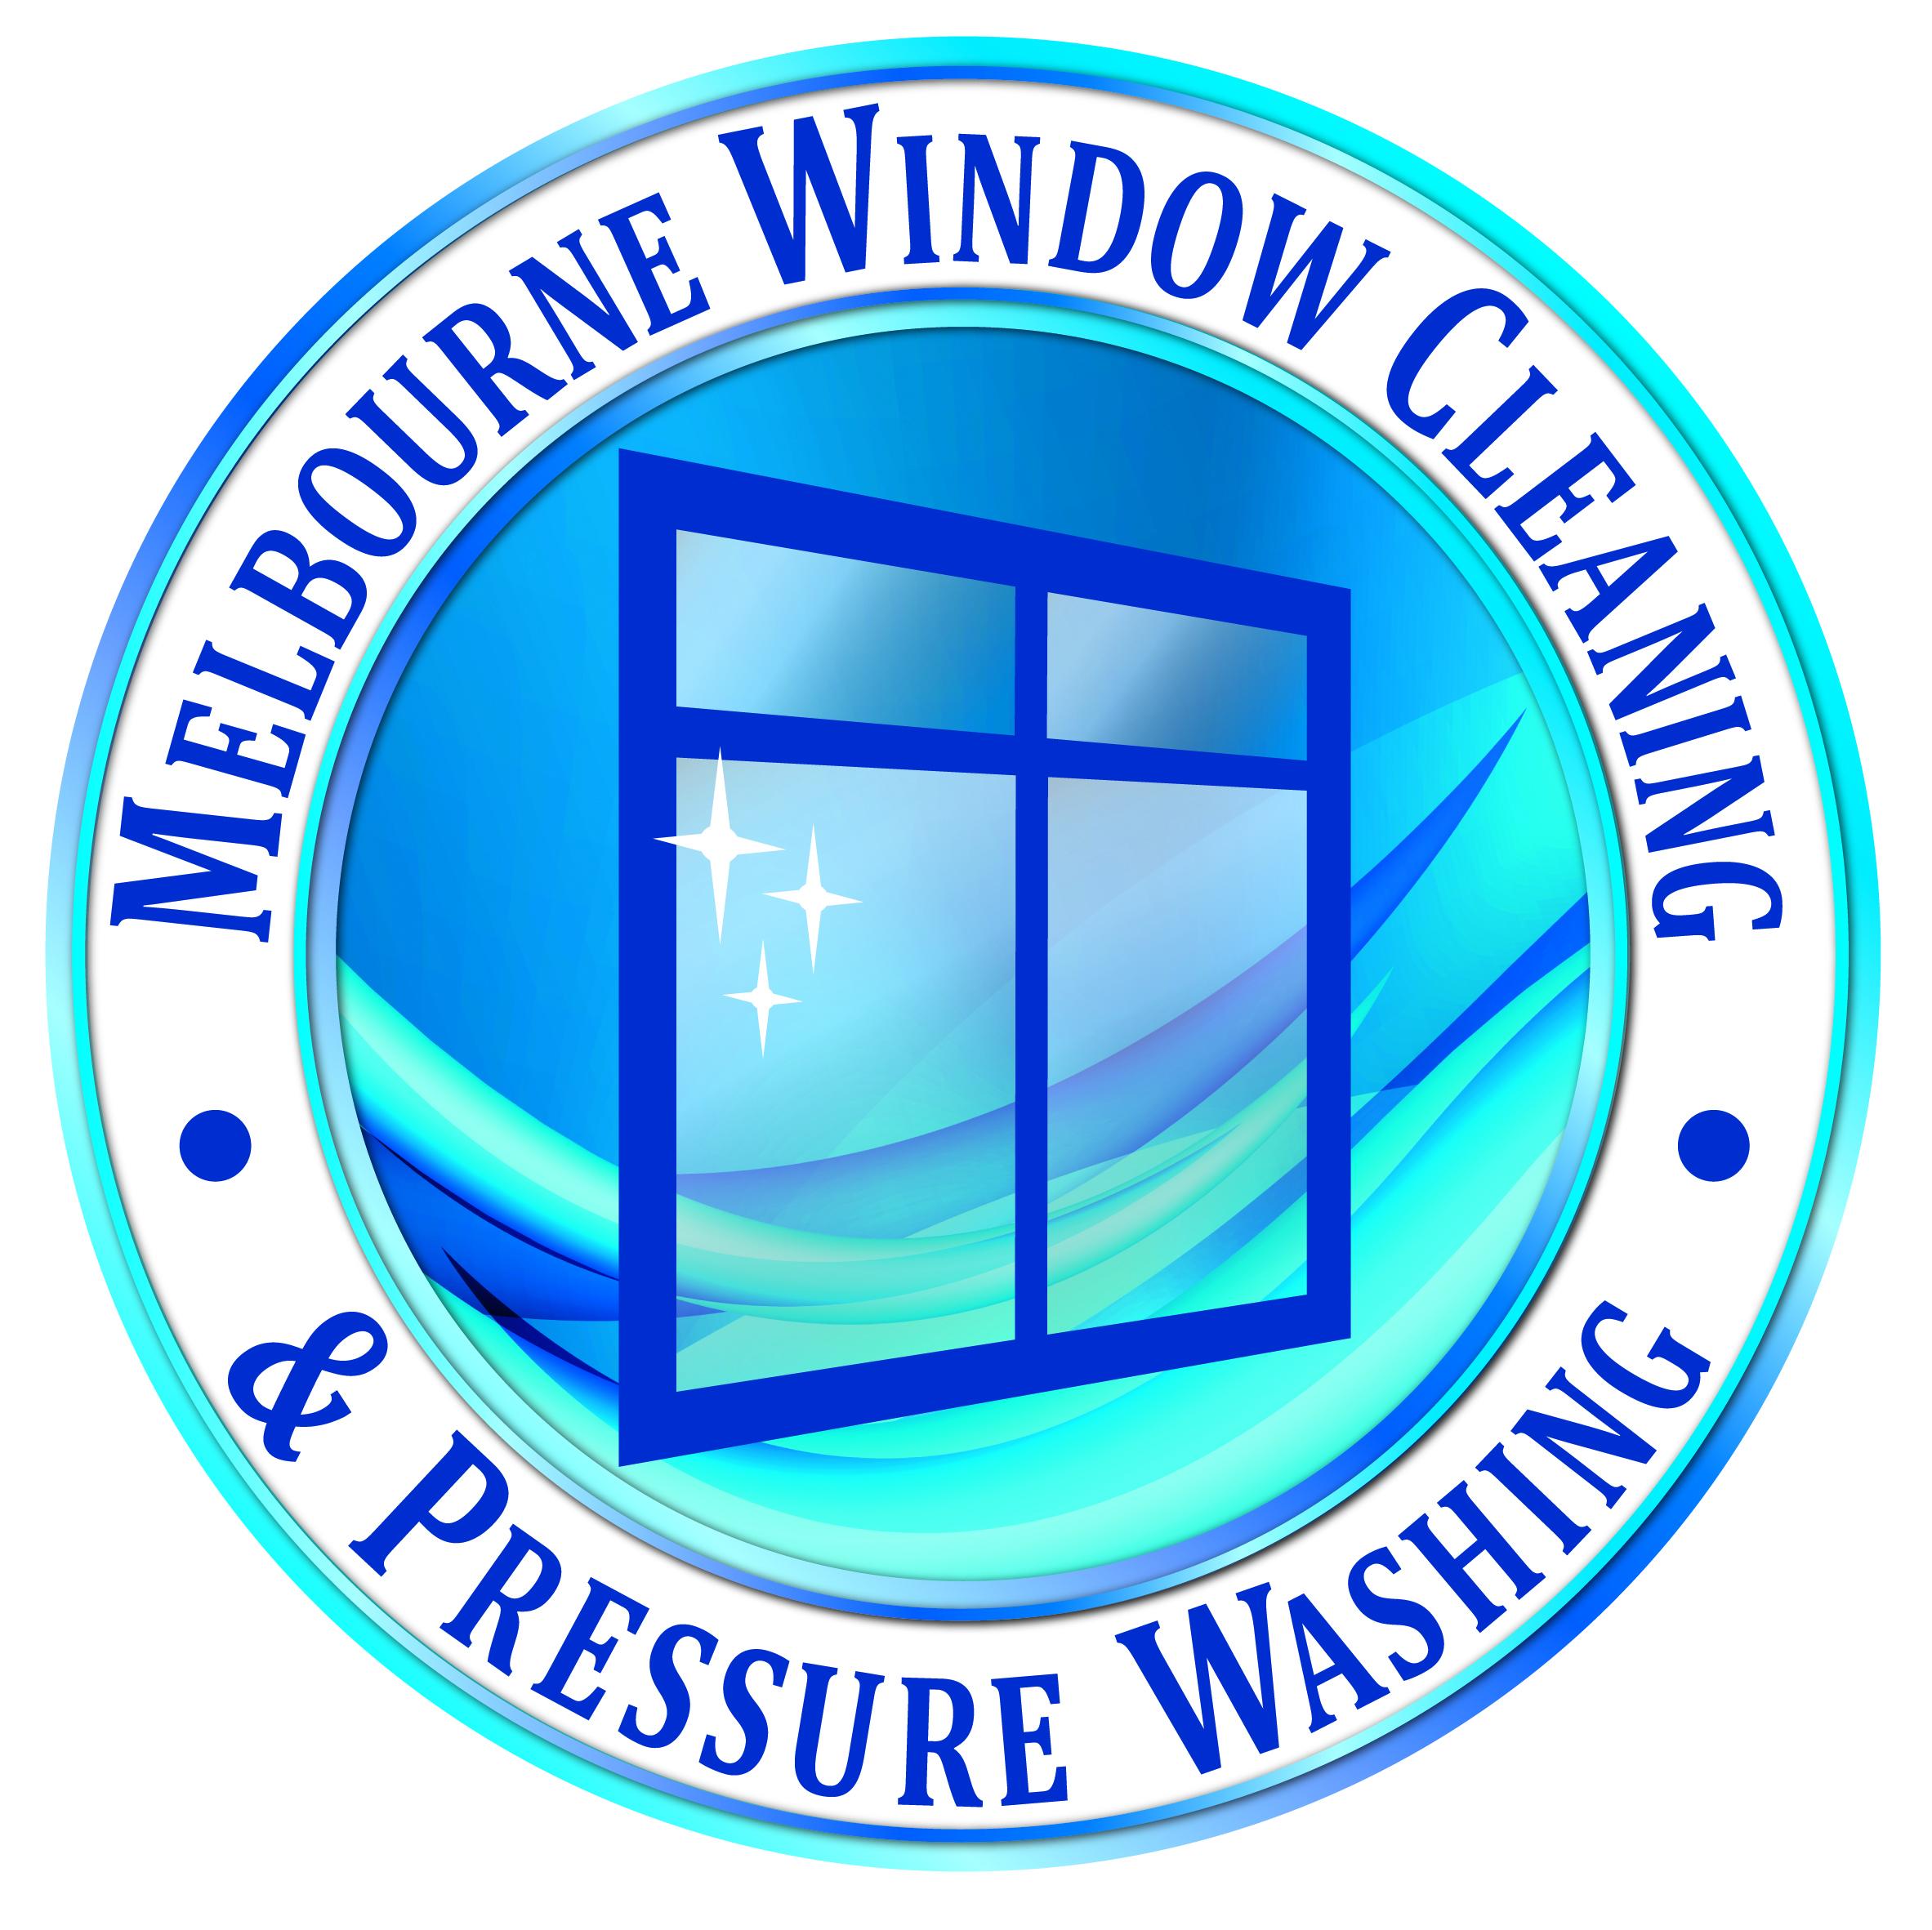 MELBOURNE WINDOW CLEANING & PRESSURE WASHING LOGO cmyk.jpg